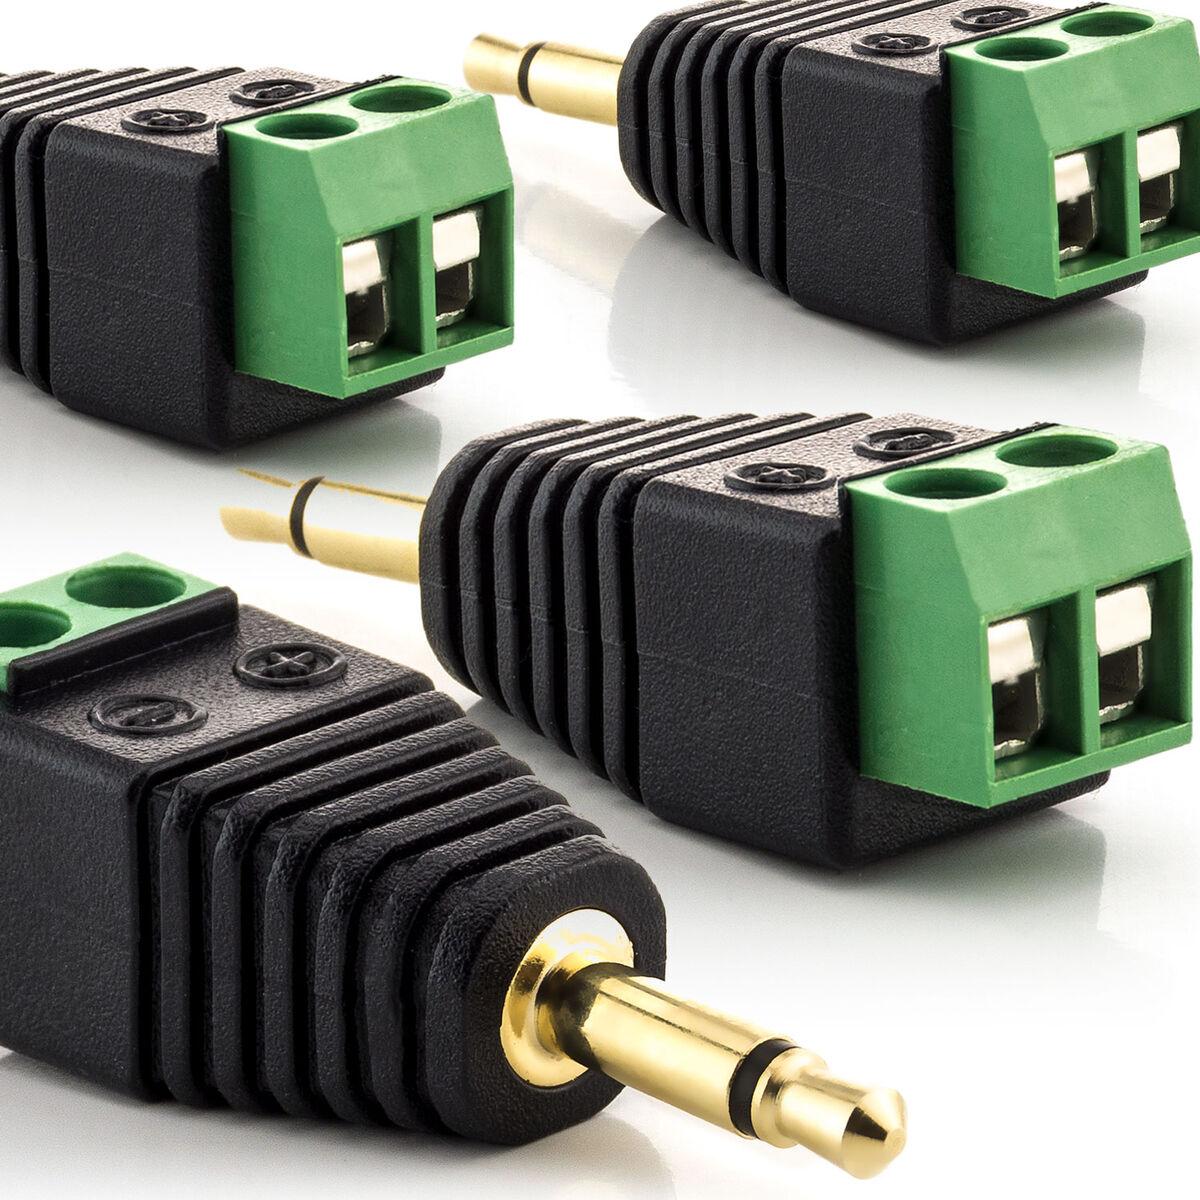 Klinke AUX Adapter Stecker 3,5 mm zu Terminal Block 3-Pin Schrauben vergoldet